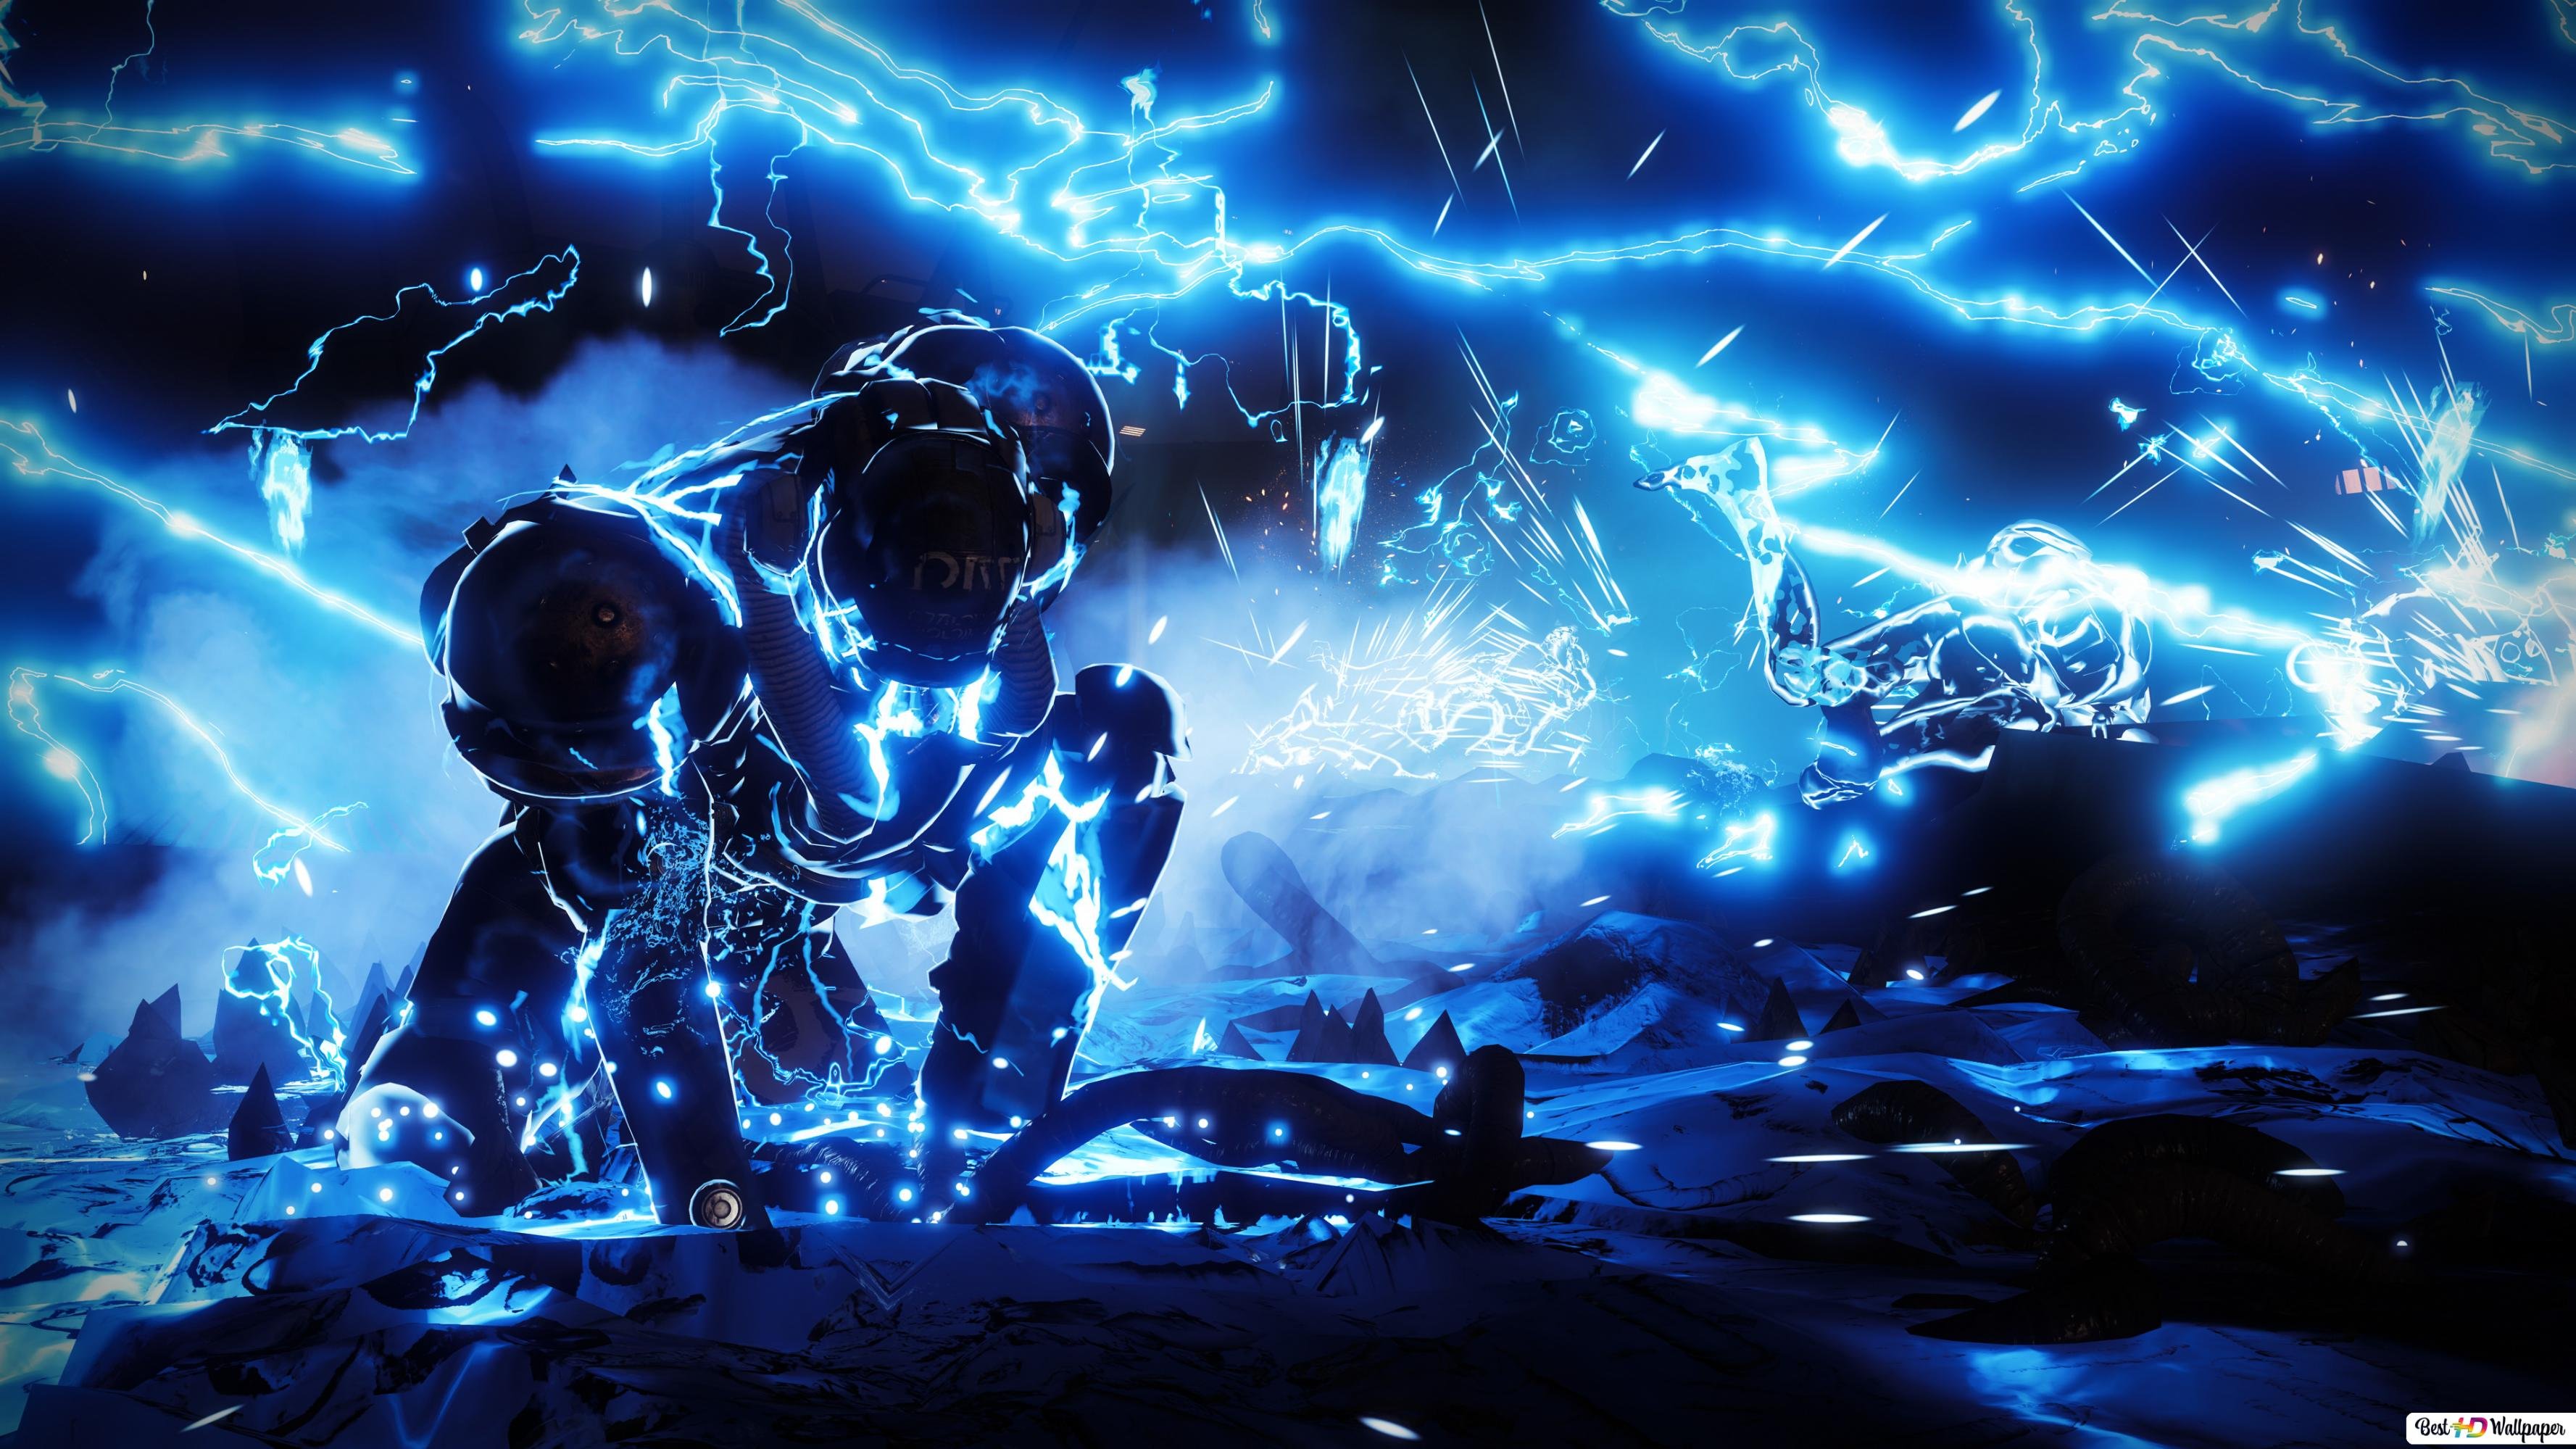 Destiny 2 Forsaken Blue Spark Hd Wallpaper Download